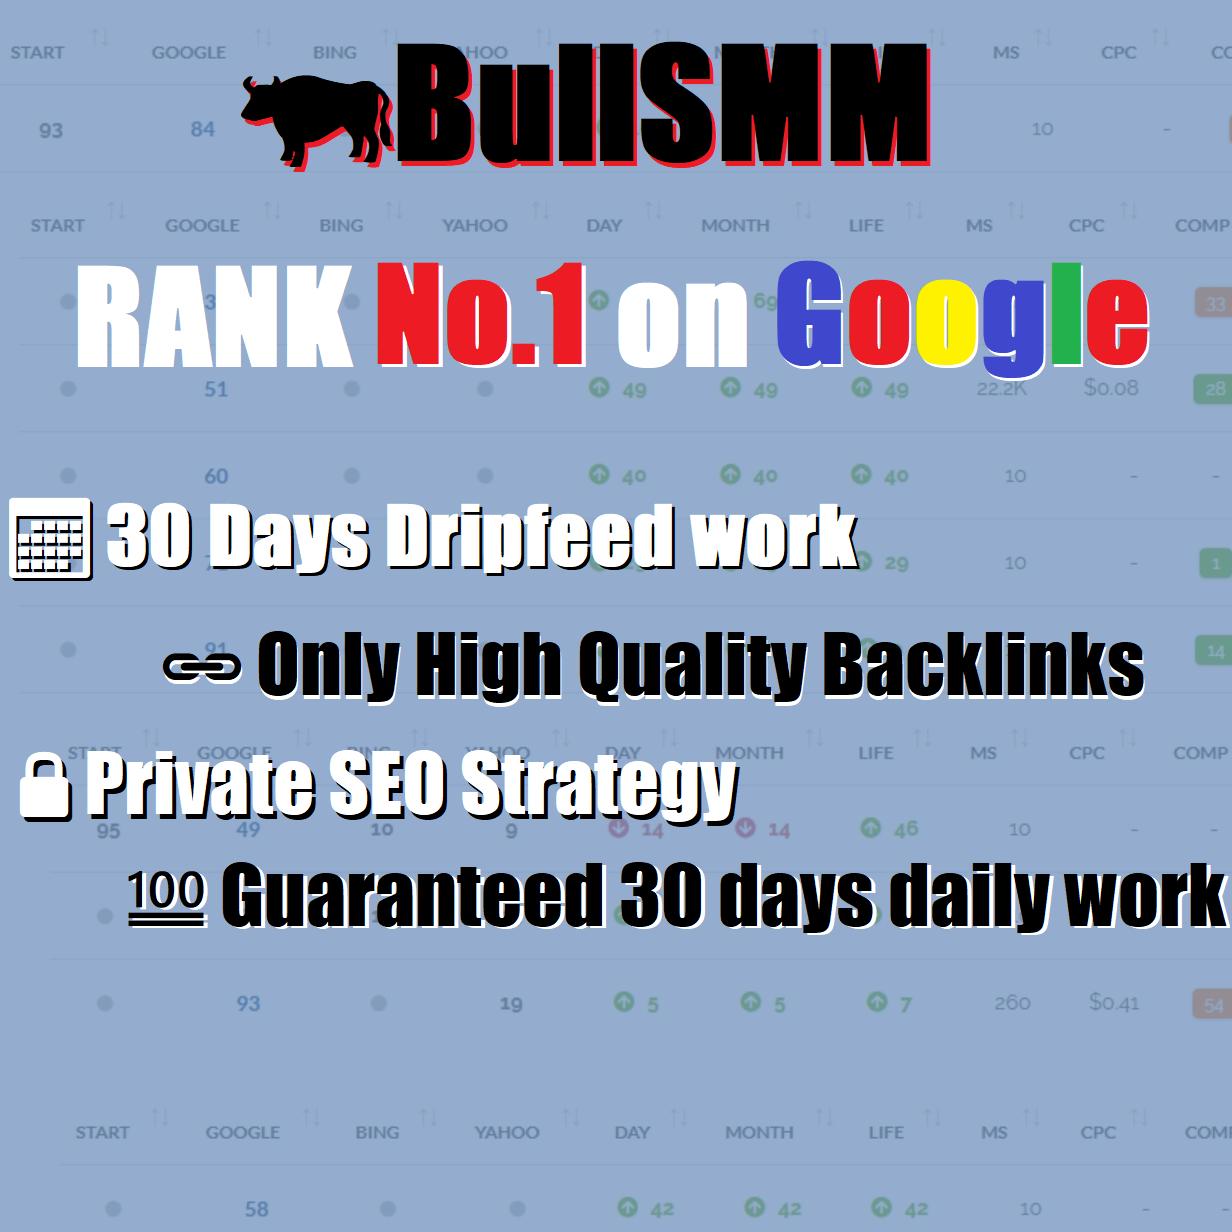 Rank No. 1 on Google Manual SEO Backlinks - 30 days website backlinks building